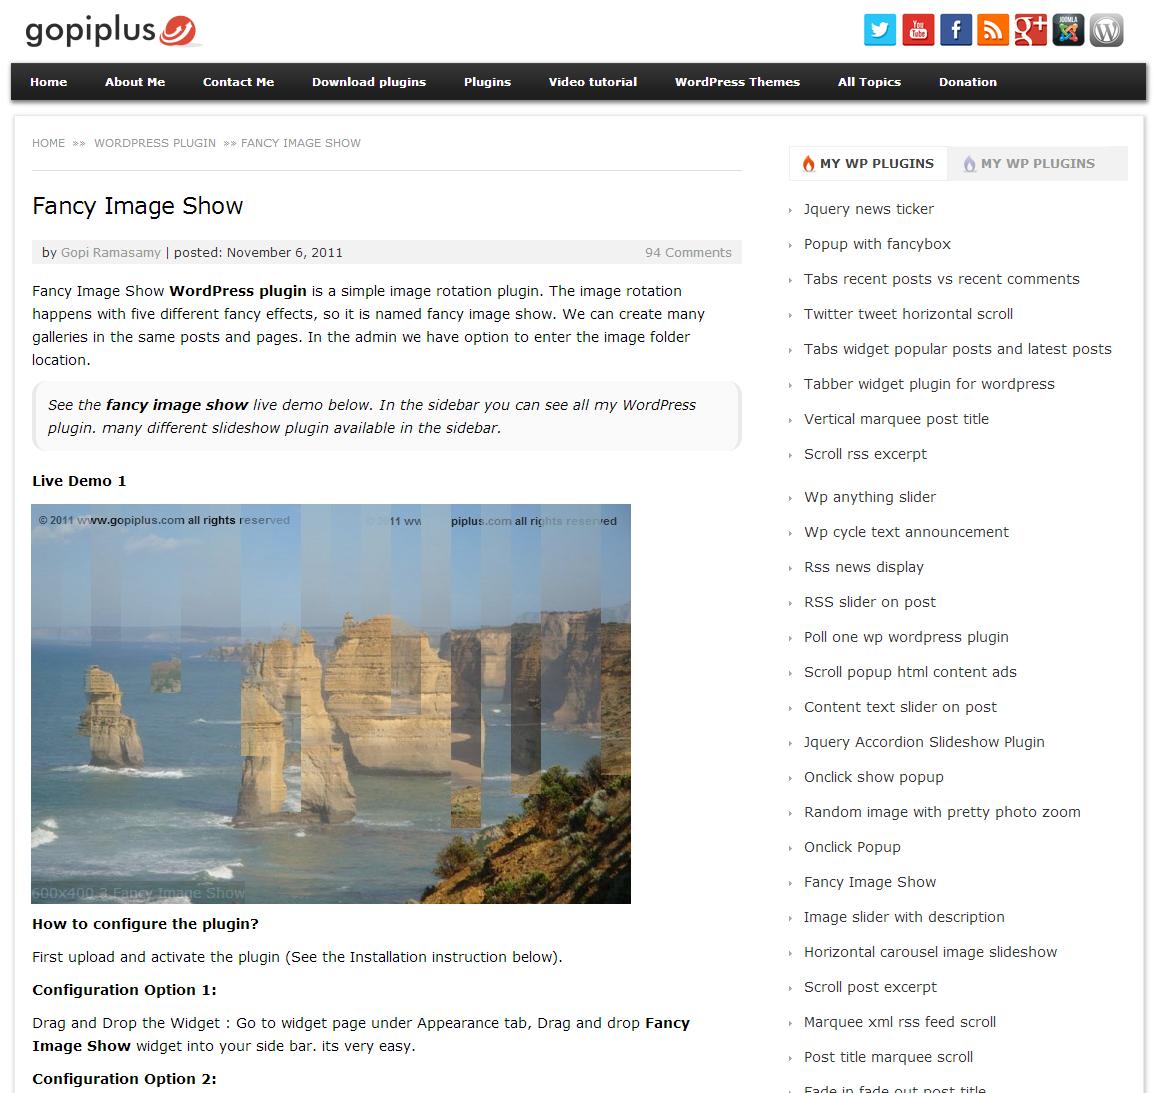 <p>Front Screen. http://www.gopiplus.com/work/2011/11/06/fancy-image-show-wordpress-plugin/</p>